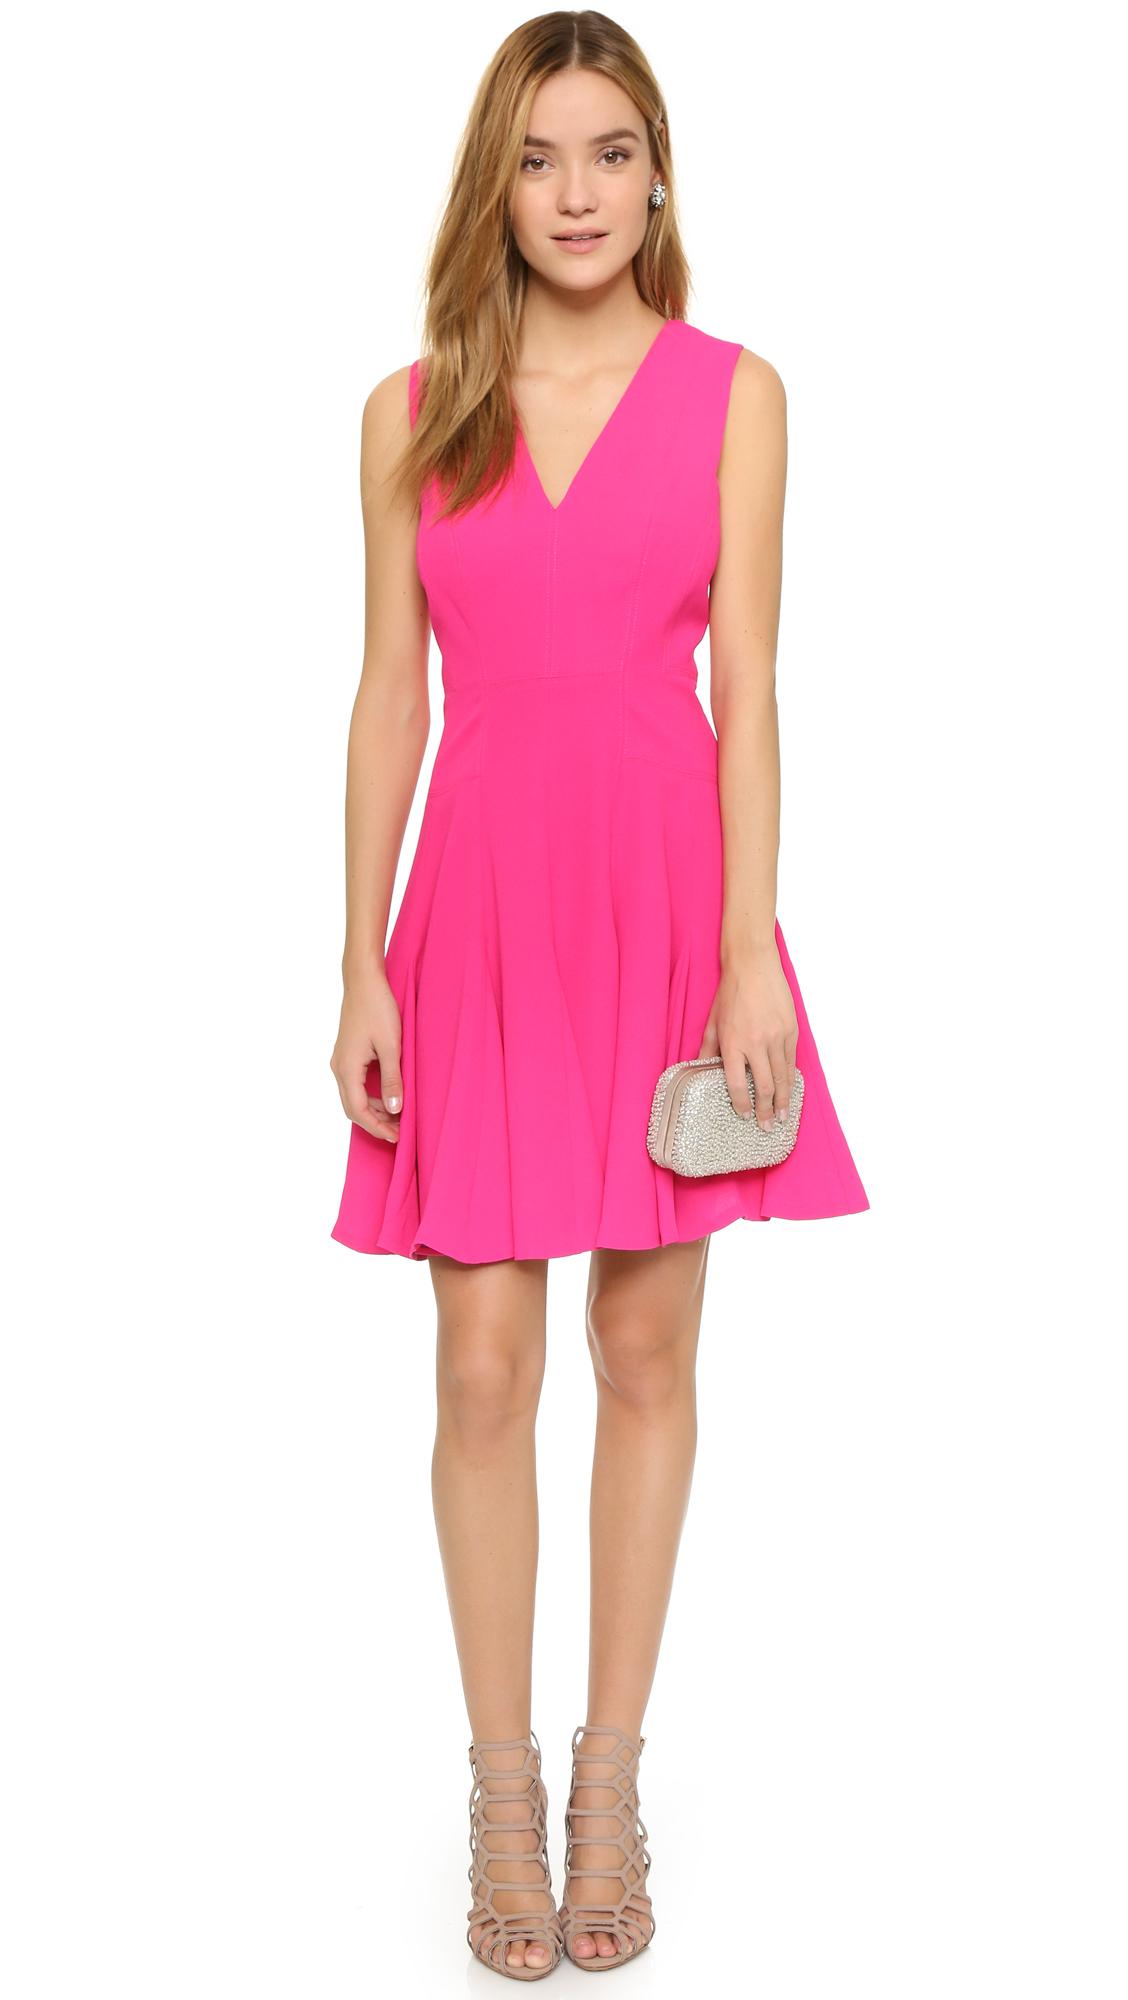 921e128f40d Rebecca Taylor Crepe V Neck Dress in Pink - Lyst